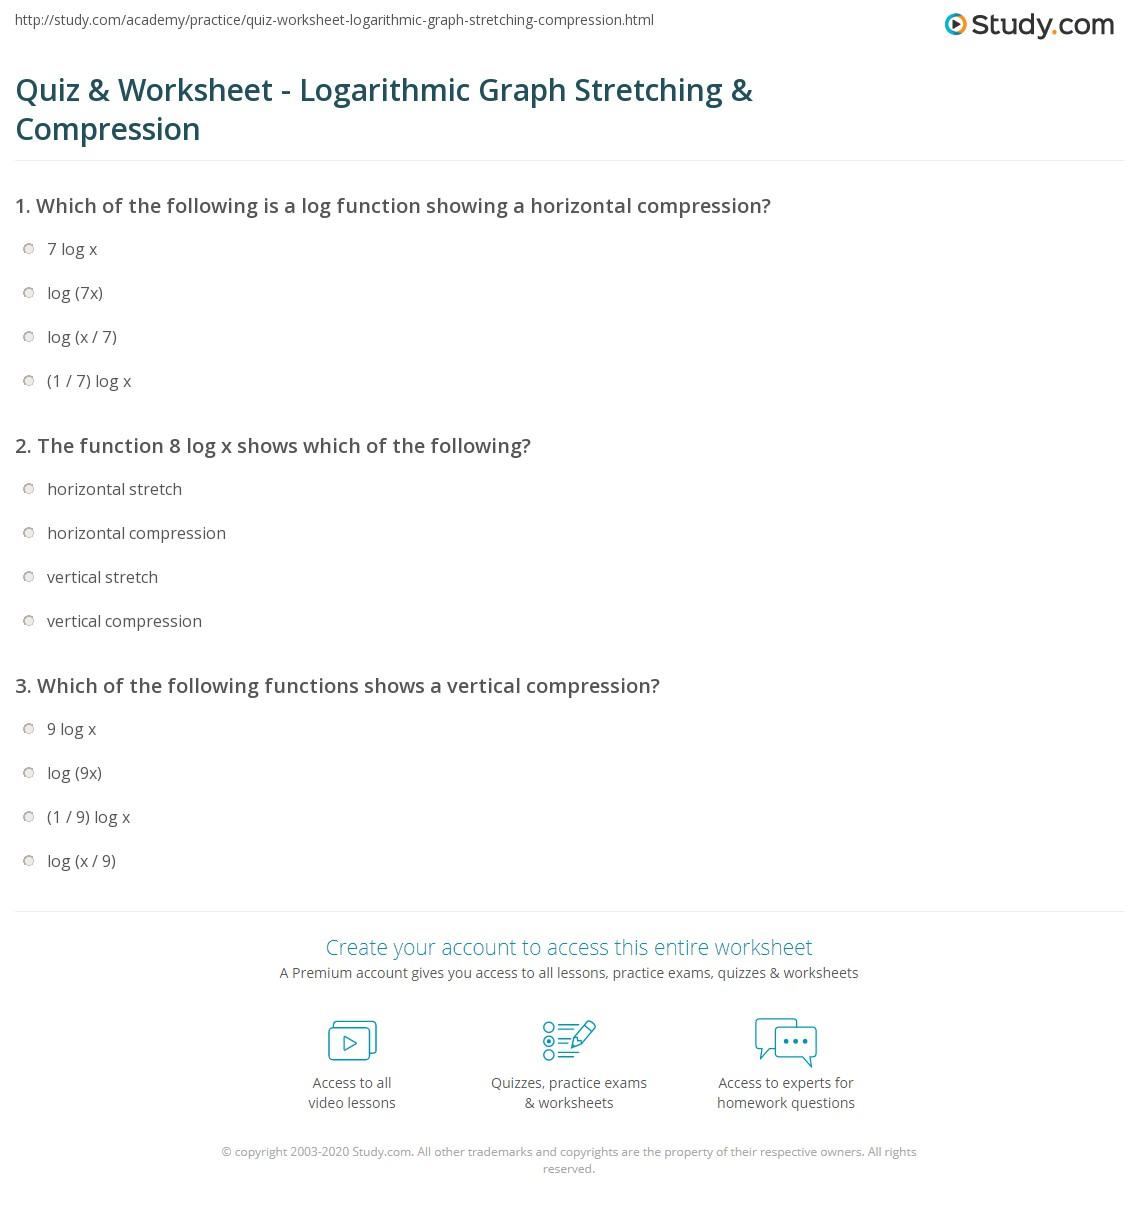 Quiz Worksheet Logarithmic Graph Stretching Compression – Graphing Logarithmic Functions Worksheet